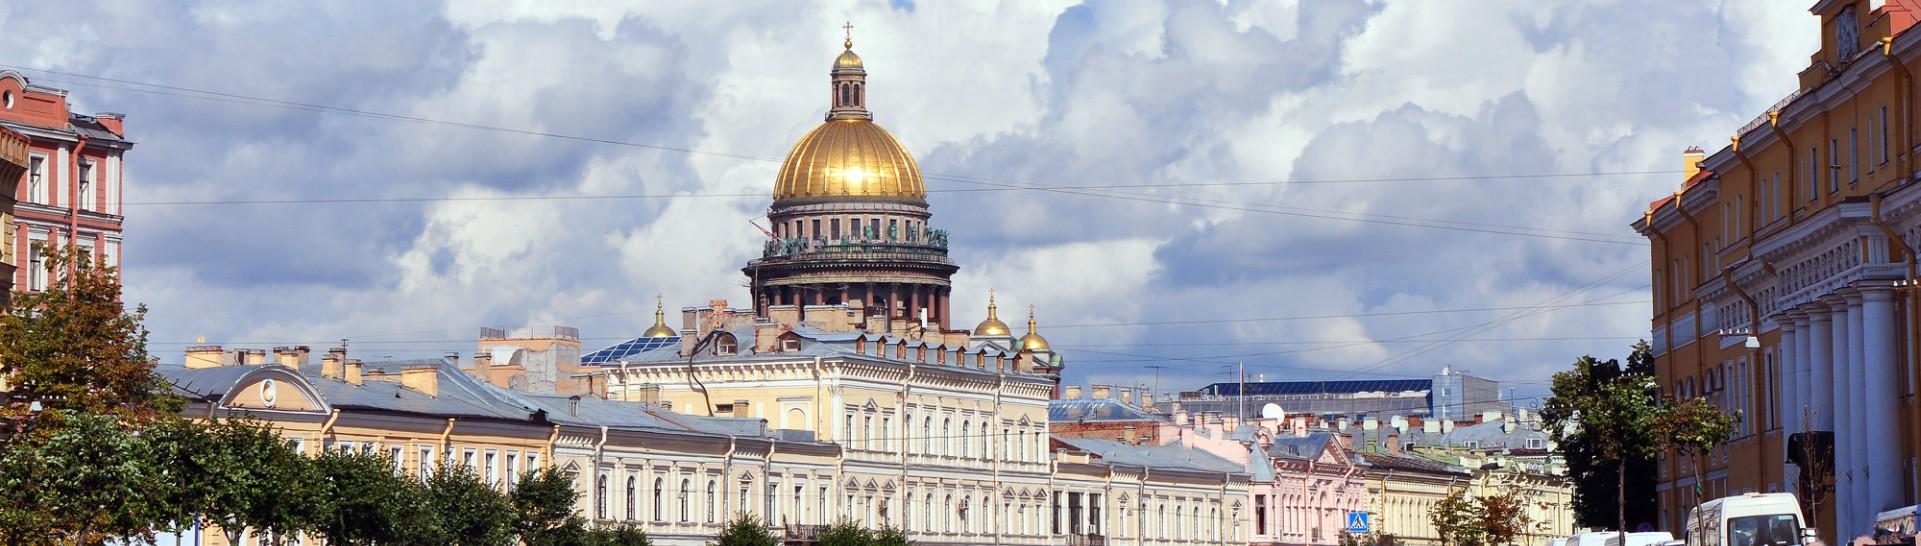 River in Saint Petersburg